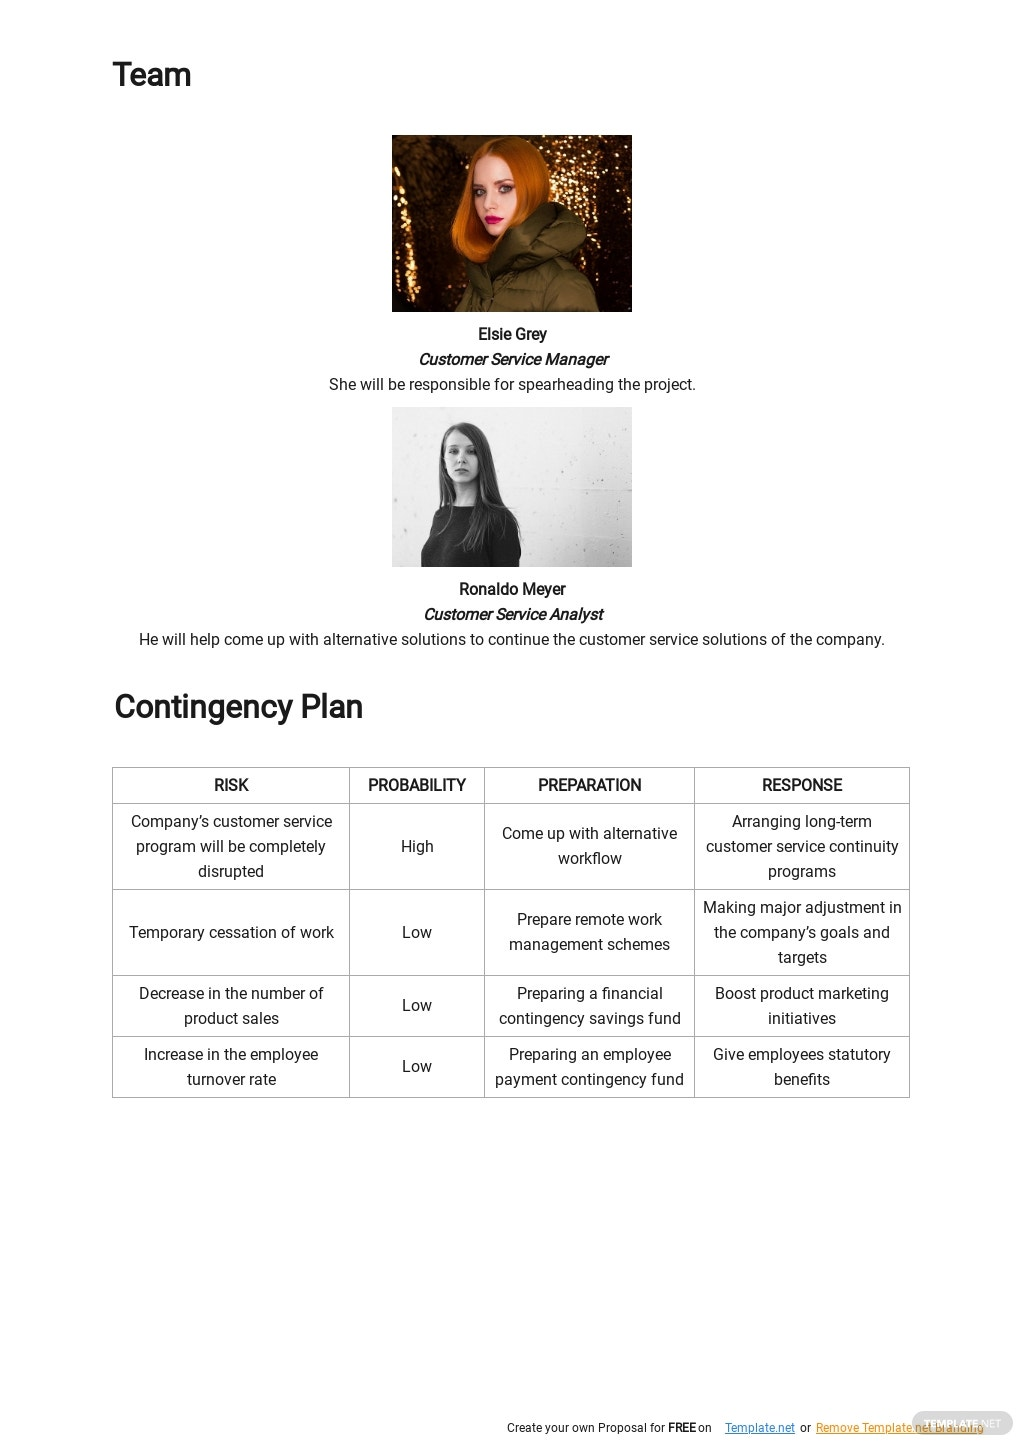 Customer Service Continuity Plan Template 2.jpe